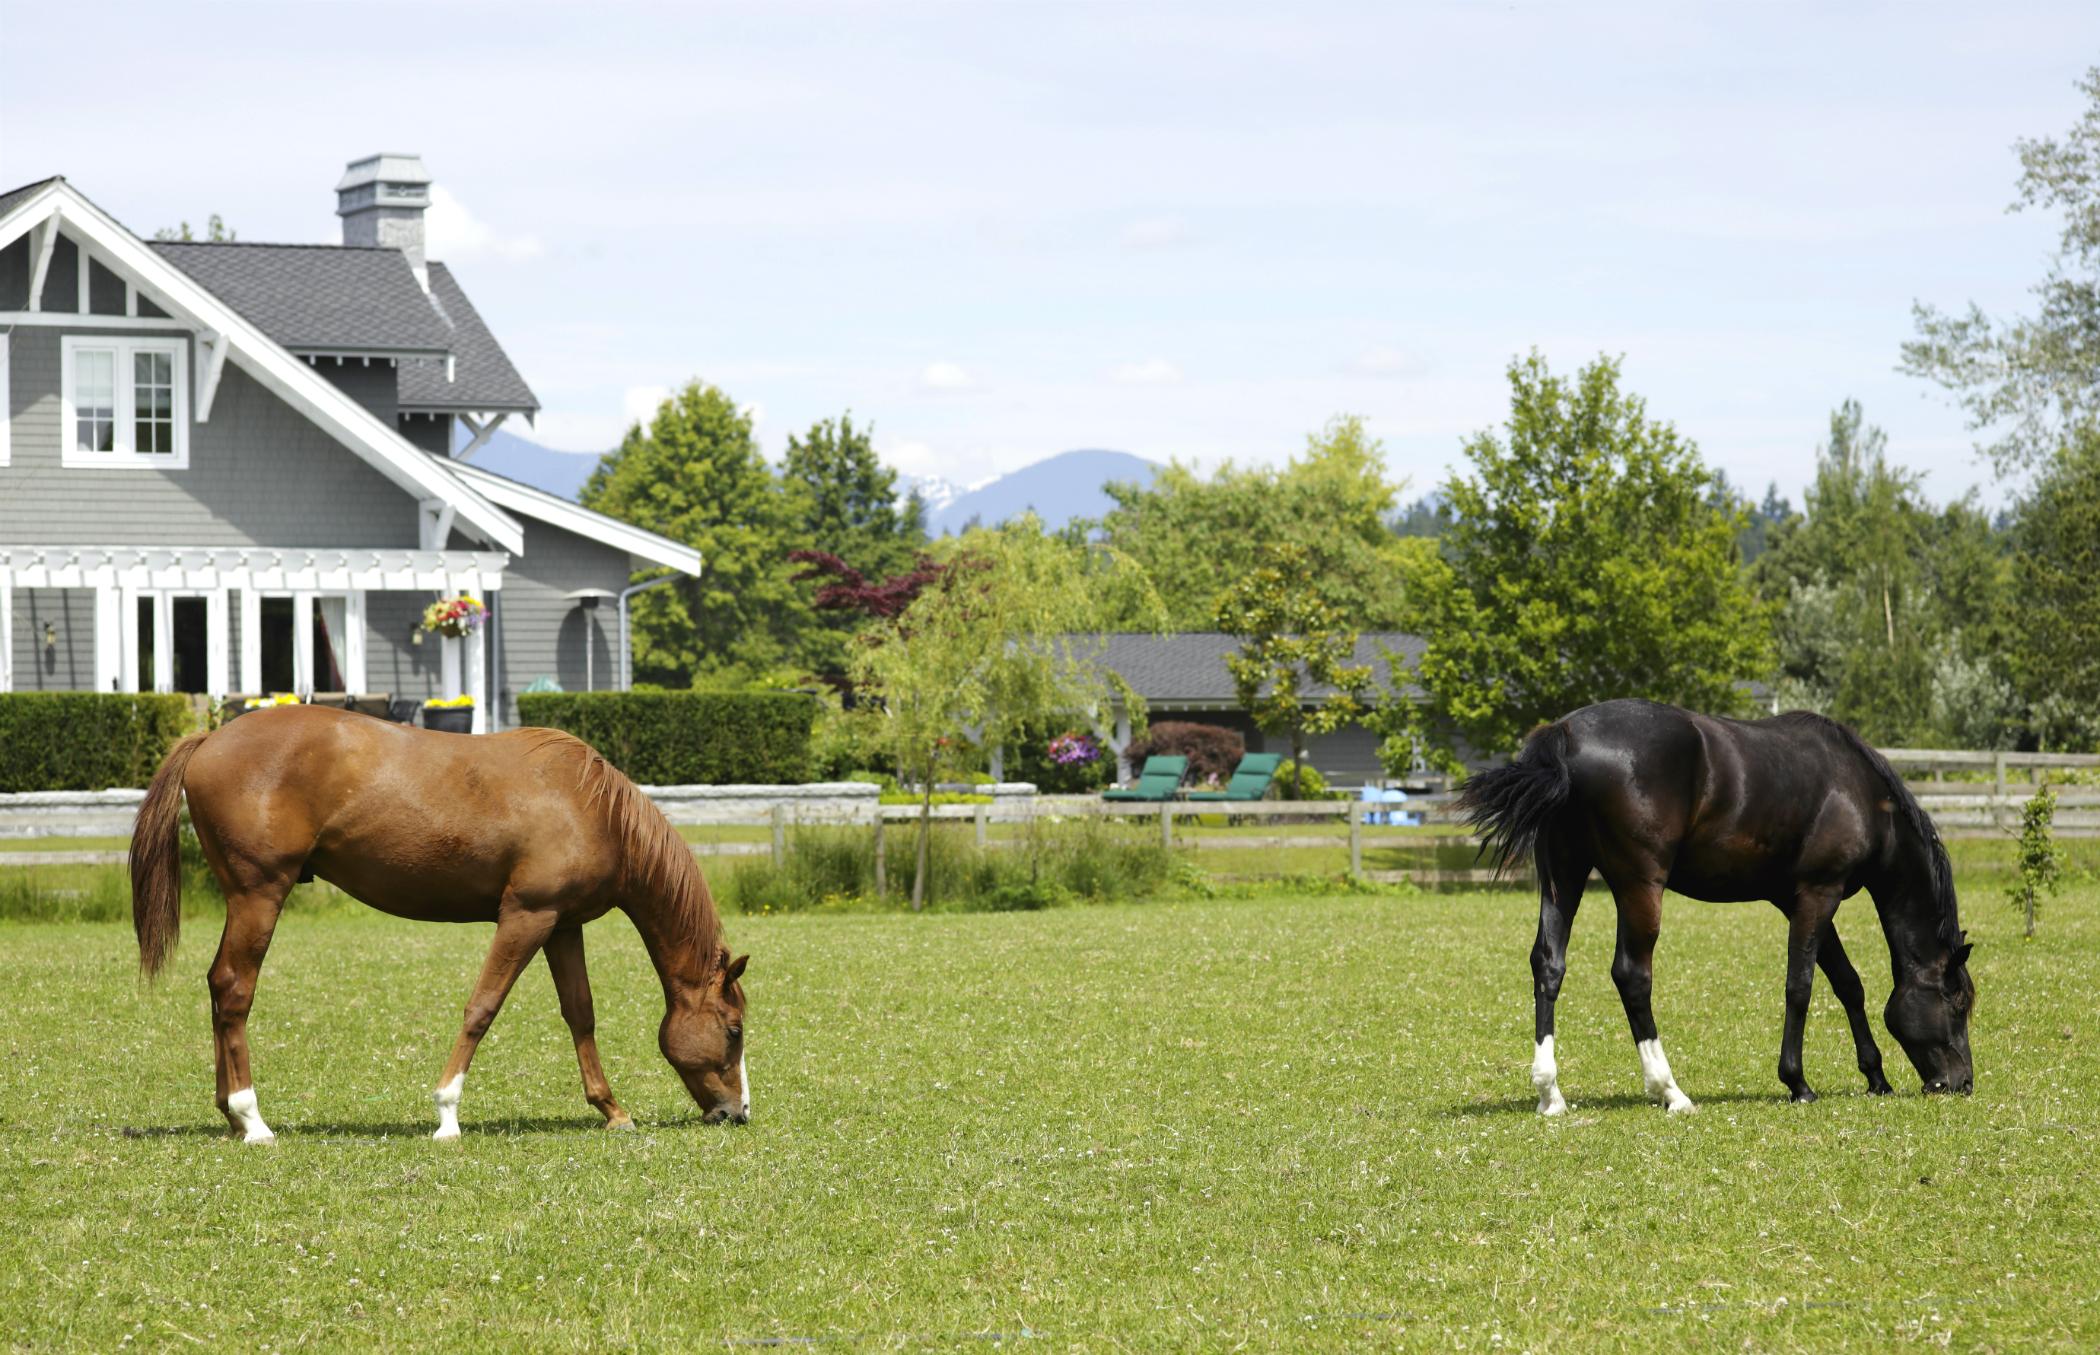 Dayton Area Horse Properties - Equestrian Properties for